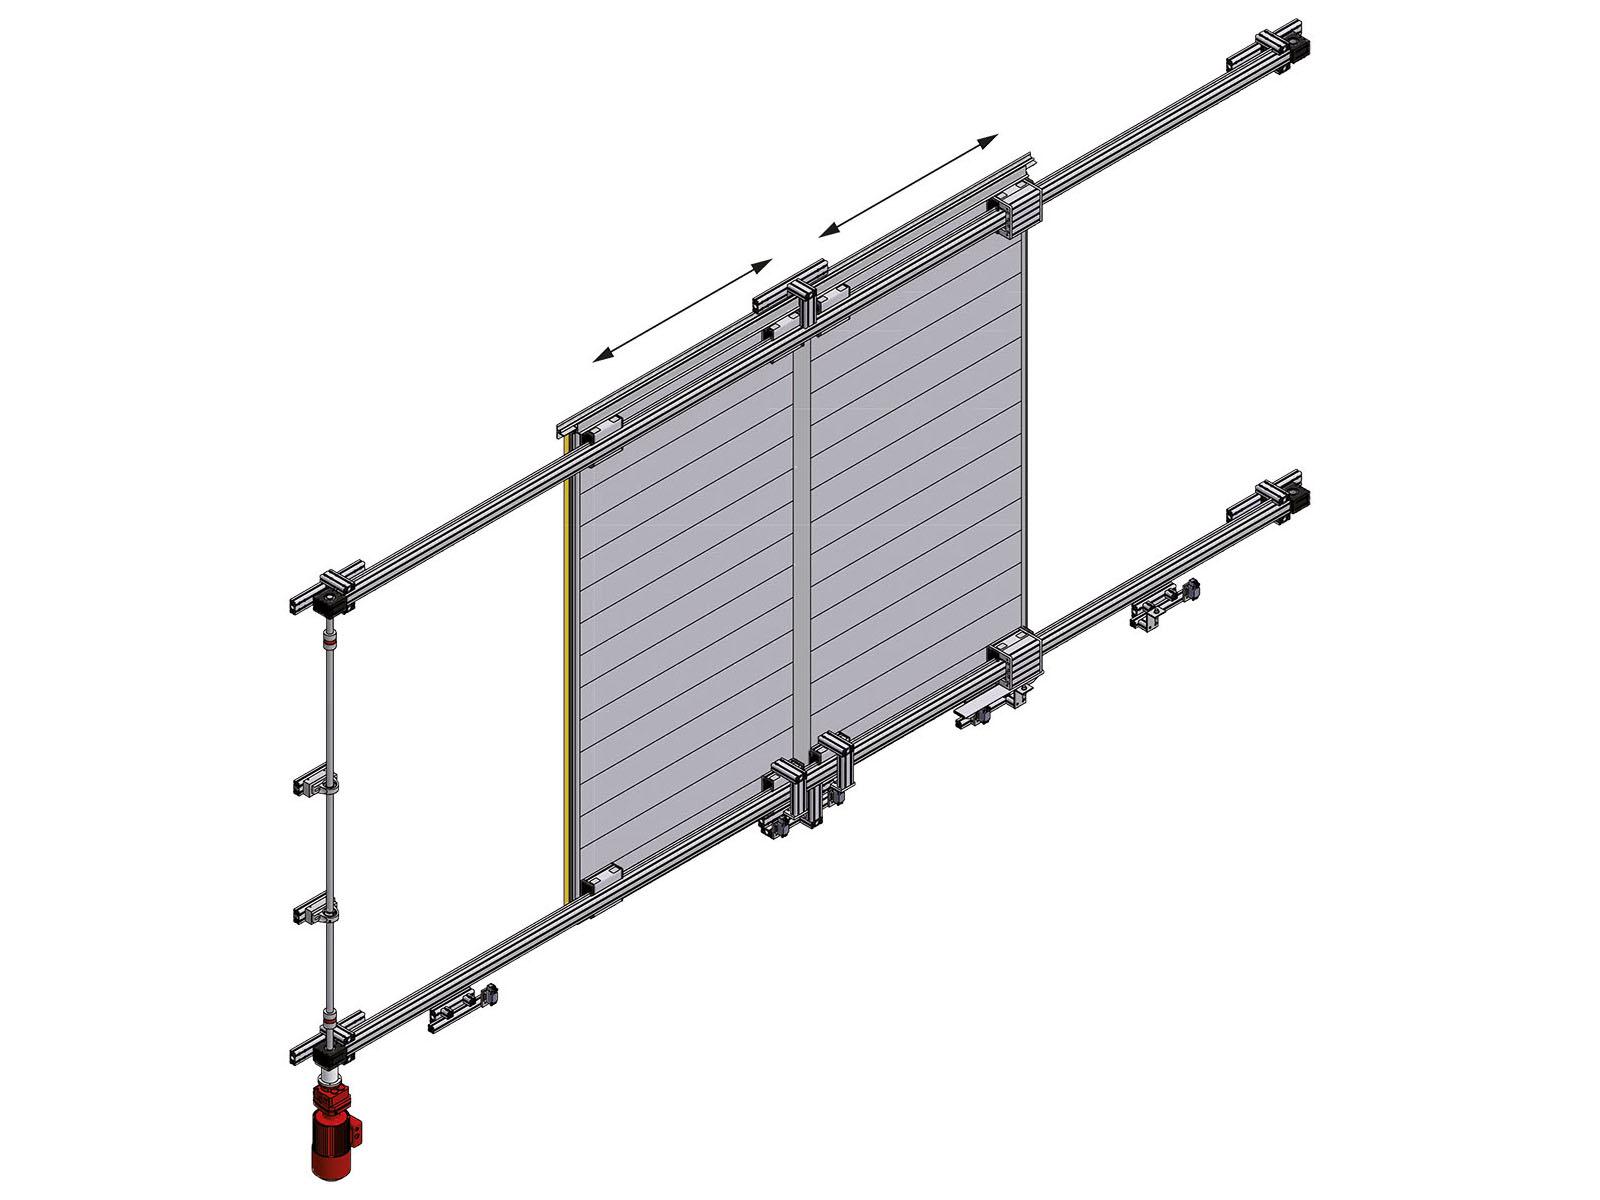 Paletti framing system - Schiebeprozesstor (1) copy copy.jpg